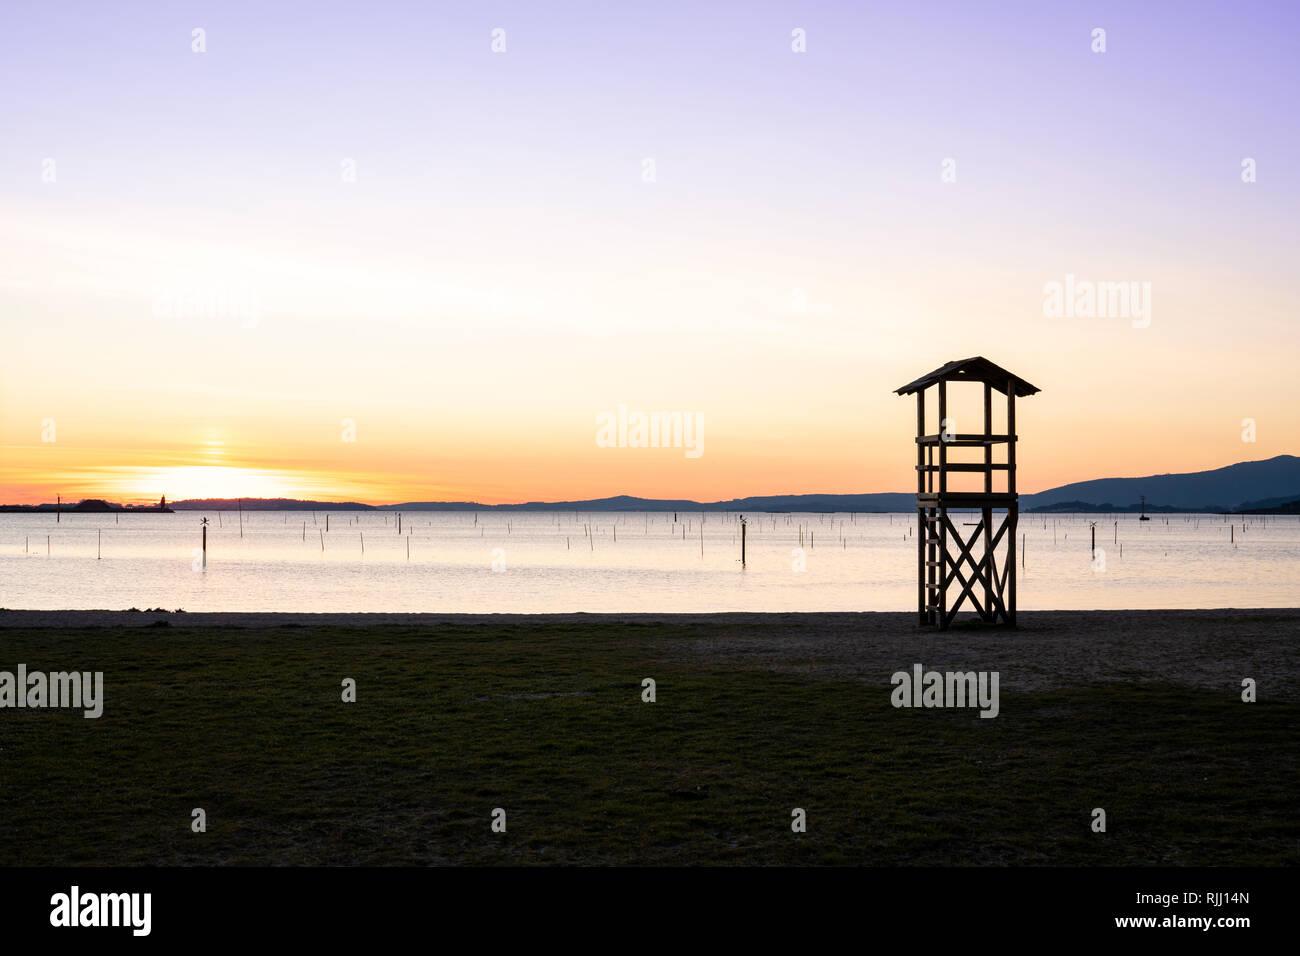 Lifeguard rescue tower on beach at sunset. Beautiful Marine landscape. Rias Baixas, Galicia, Spain - Stock Image